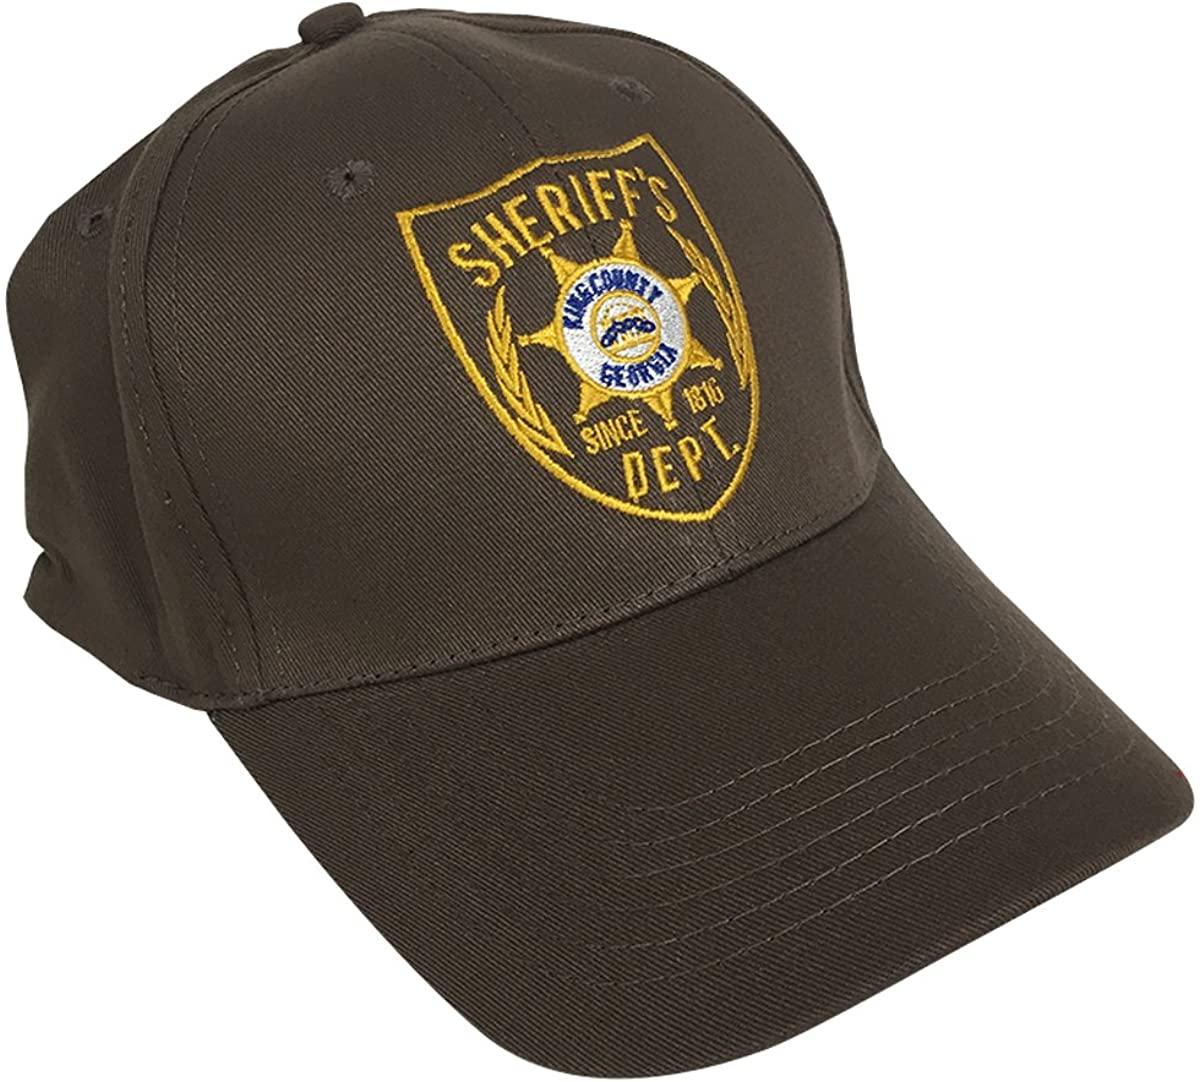 MyPartyShirt Sheriff's Dept. Hat Walking Dead Rick Grimes Costume Shane Walsh Baseball Cap Black